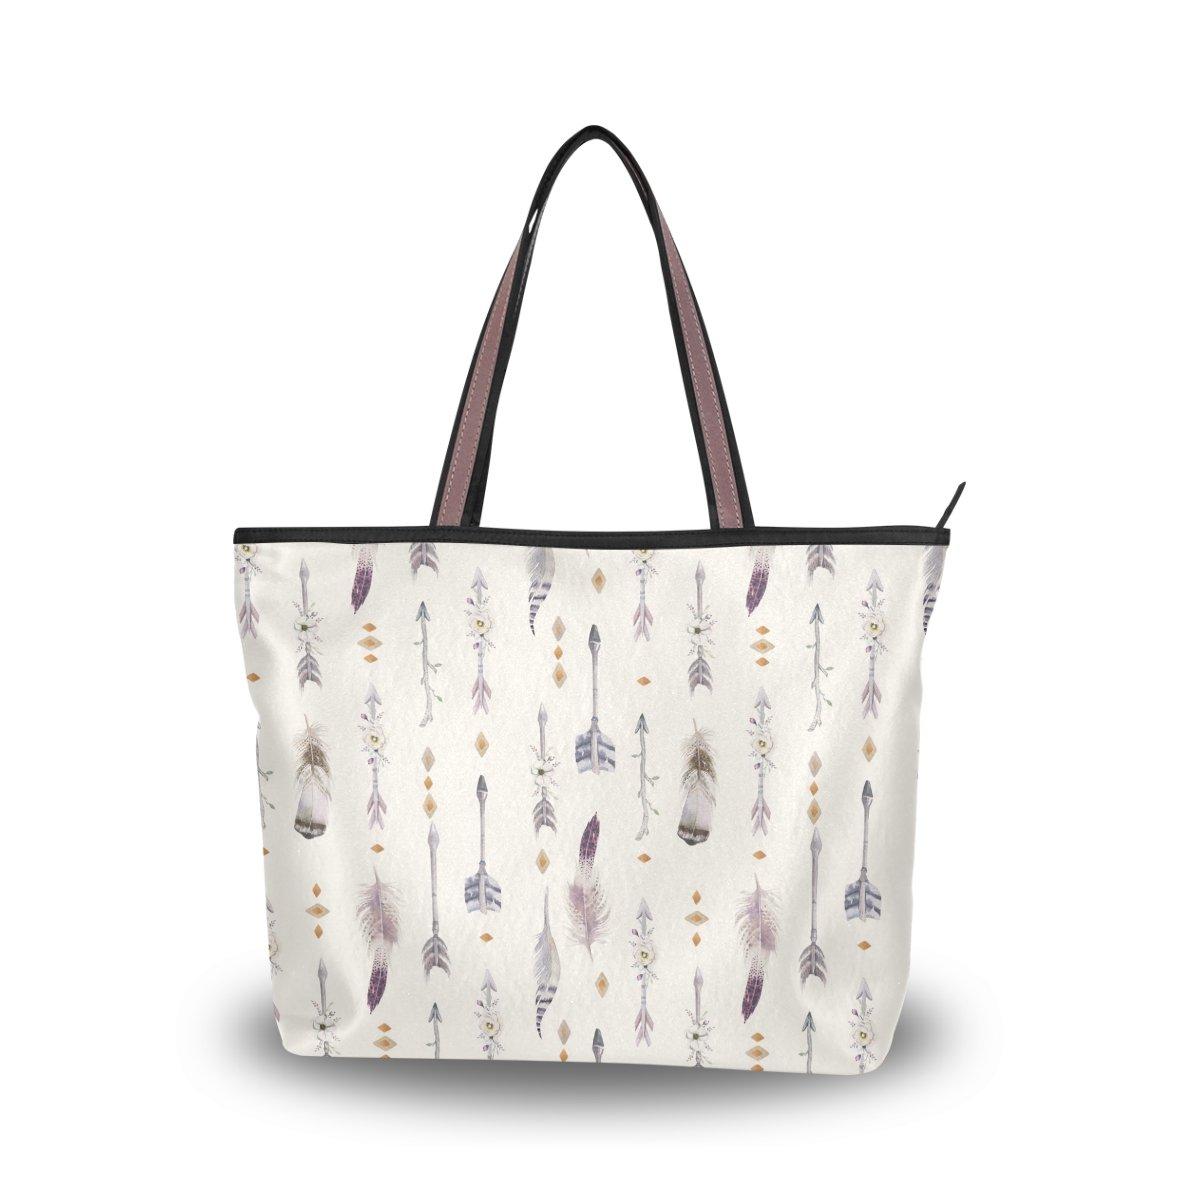 JSTEL Women Large Tote Top Handle Shoulder Bags Watercolor Boho Arrows And Feathers Patern Ladies Handbag